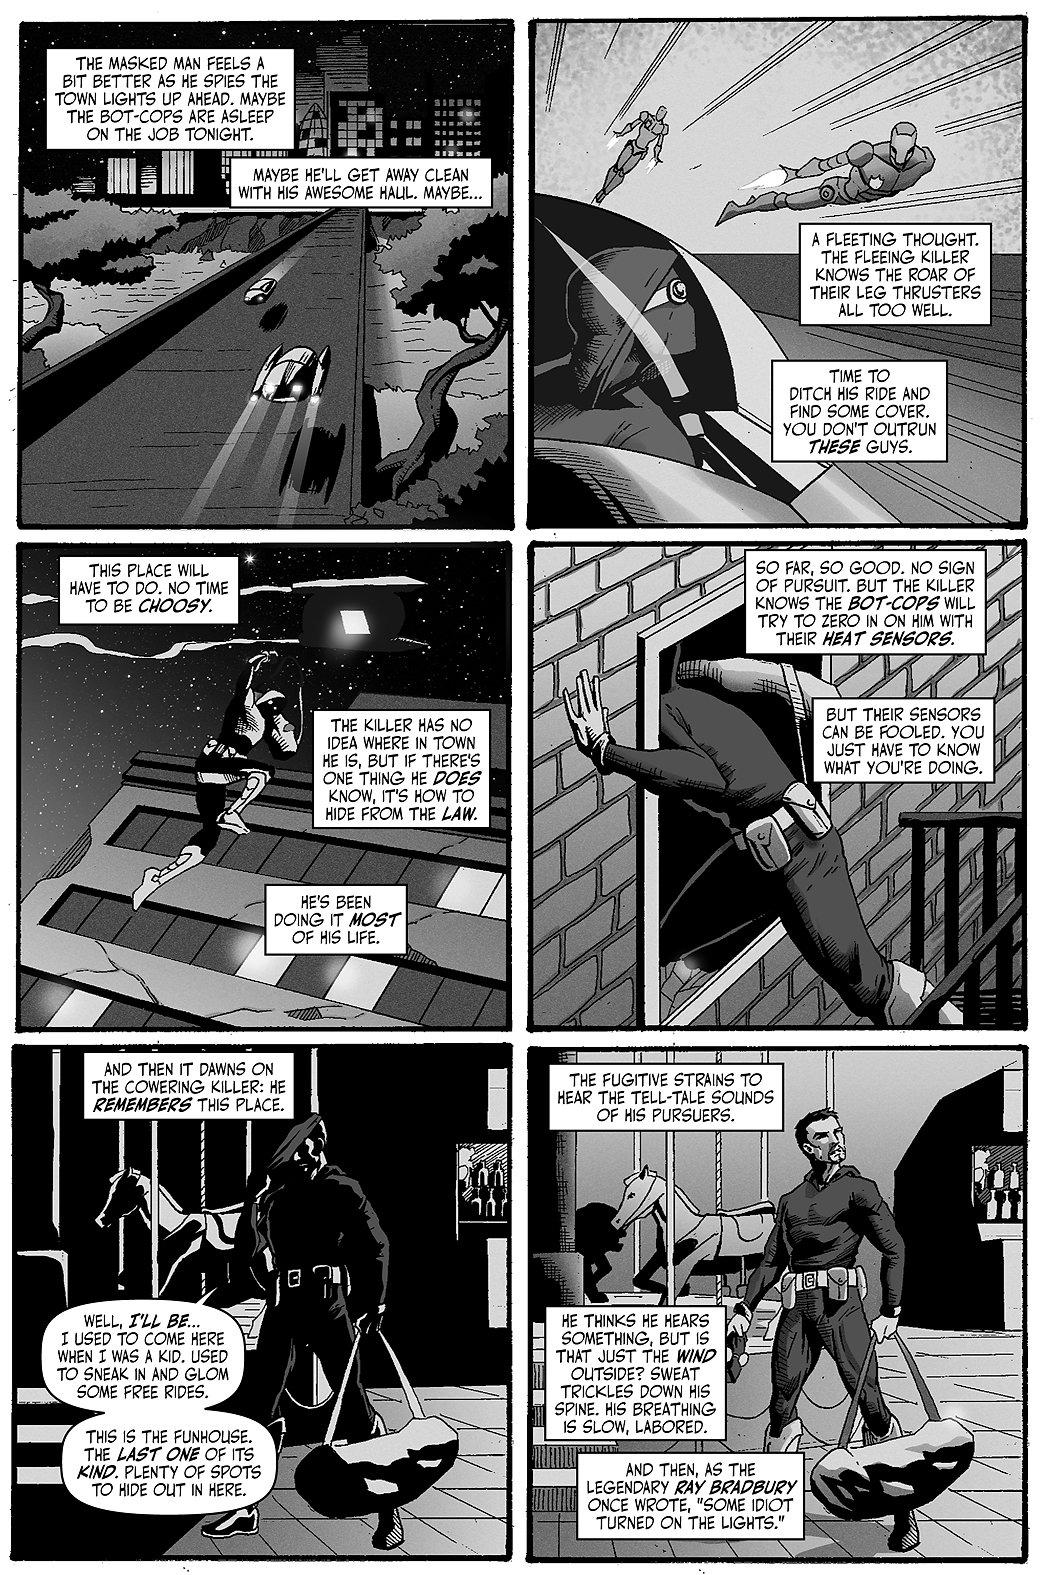 Carousel_Page02.jpg